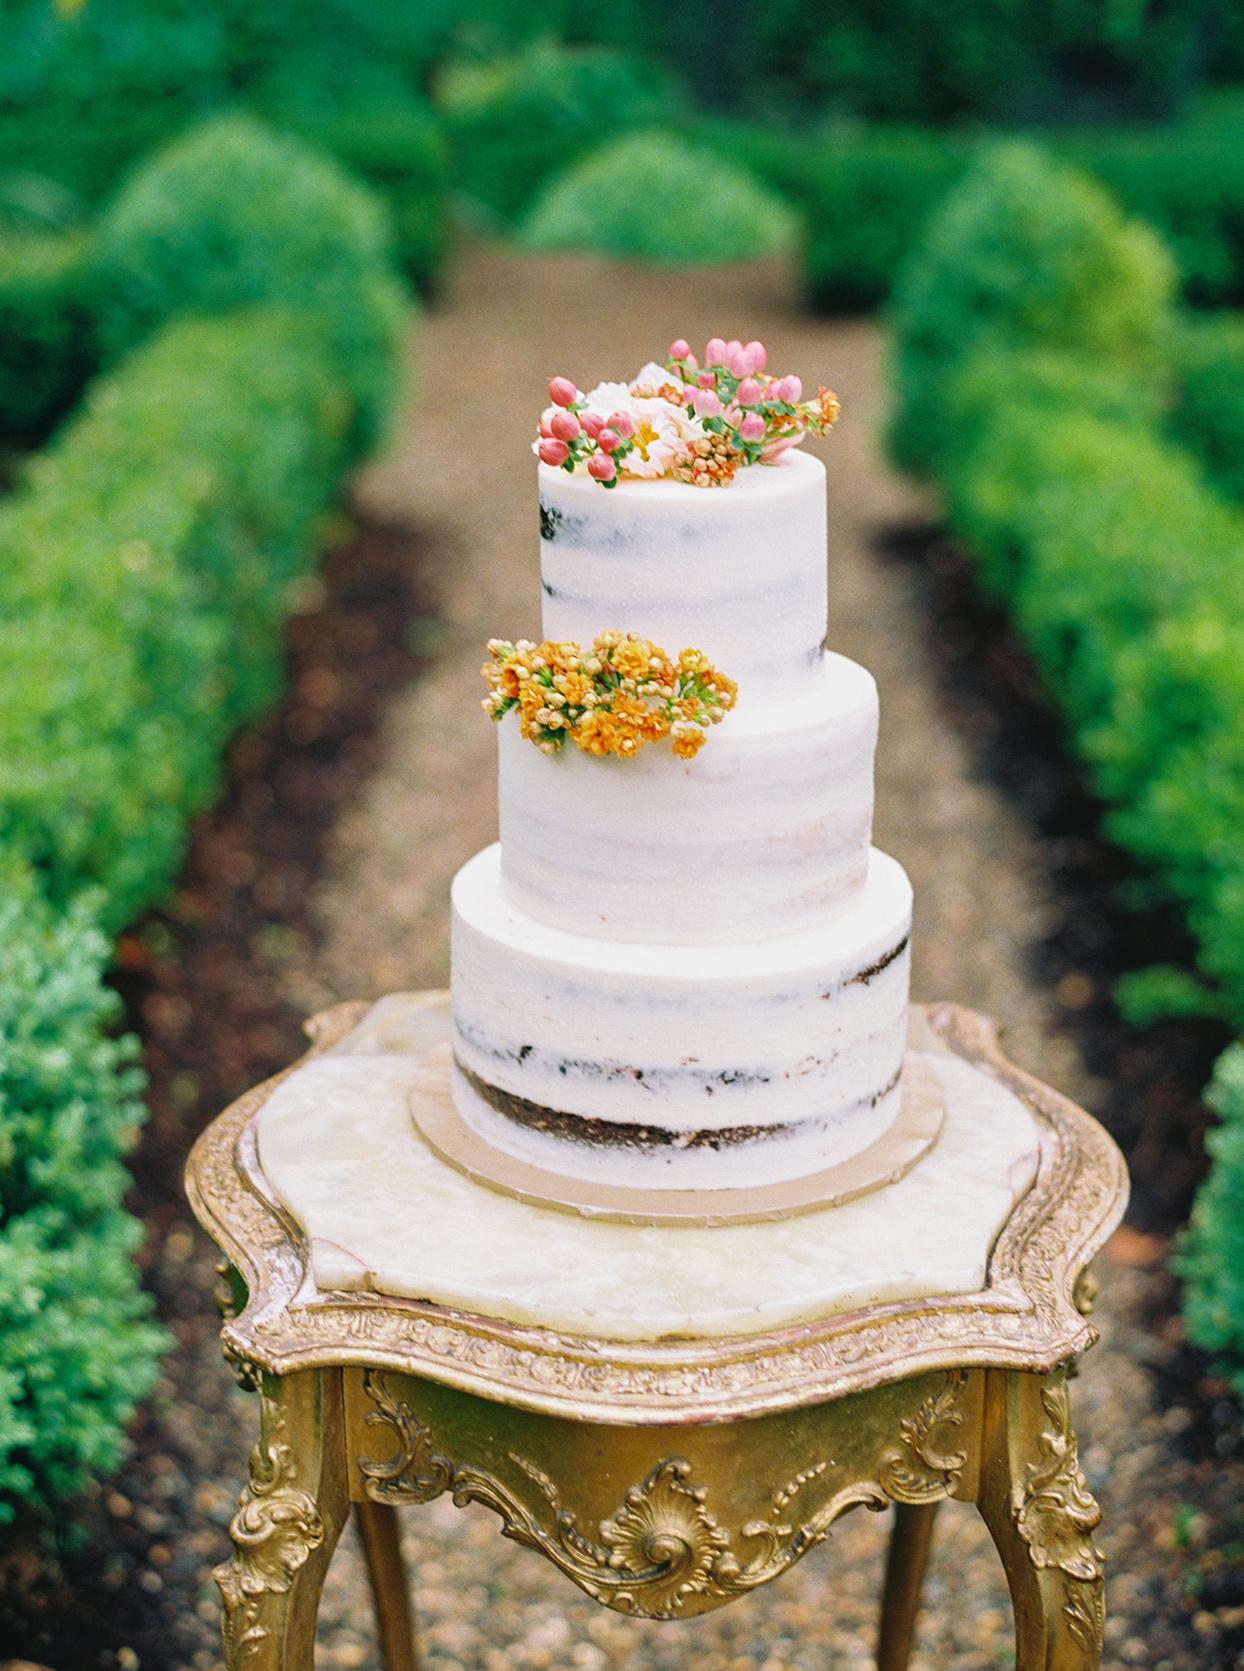 ashley scott wedding cake with flower bud decorations